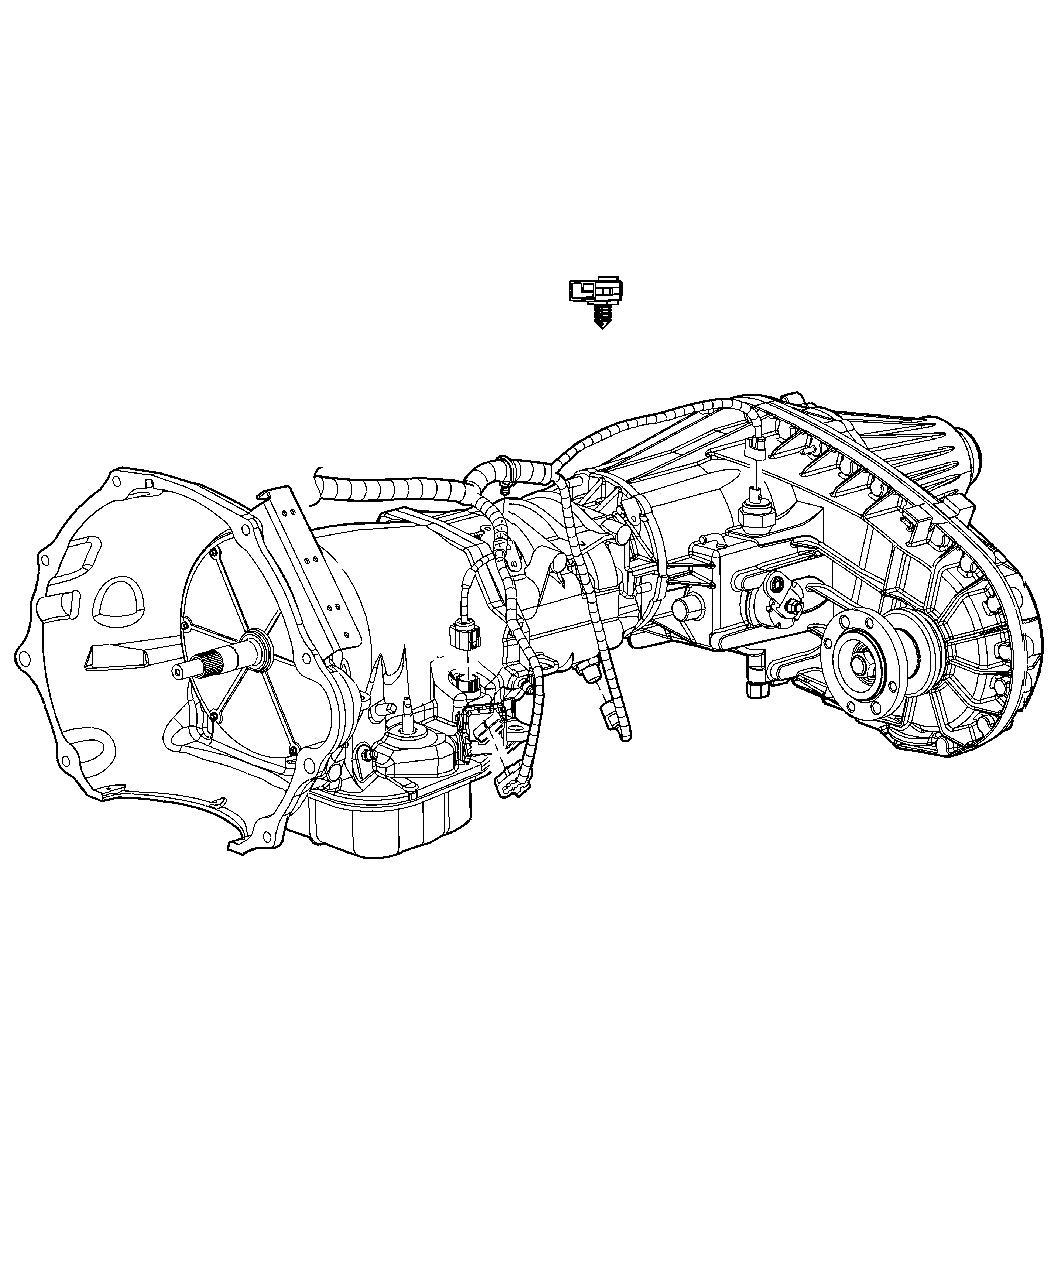 RAM 3500 Wiring. Transmission. [160 amp alternator